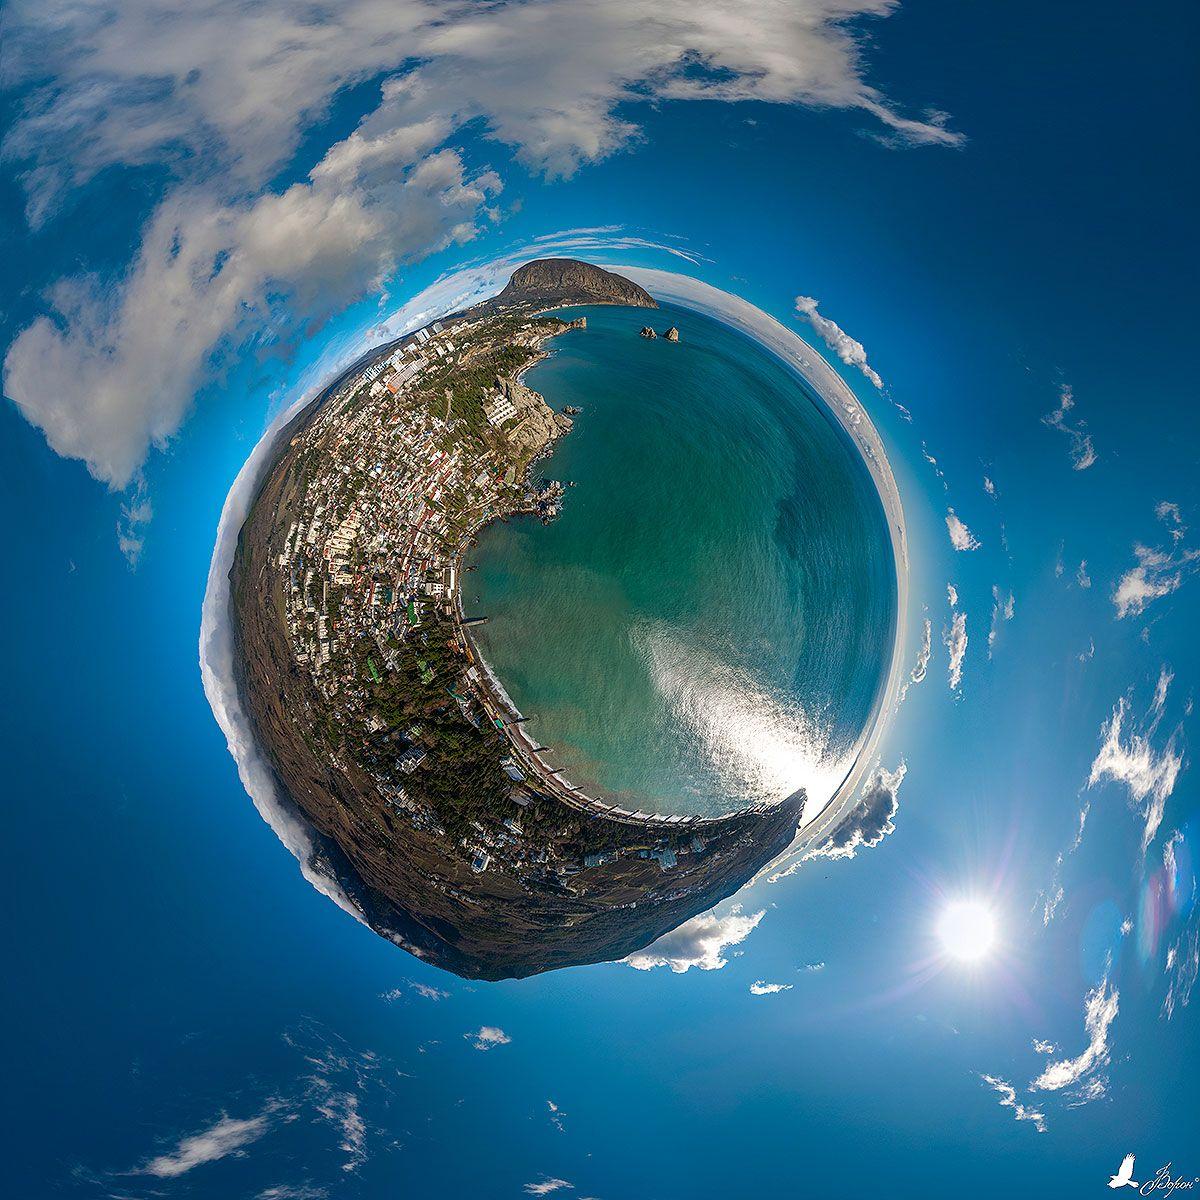 [Sphere]-DJI_0549_DJI_0587-38-images.jpg